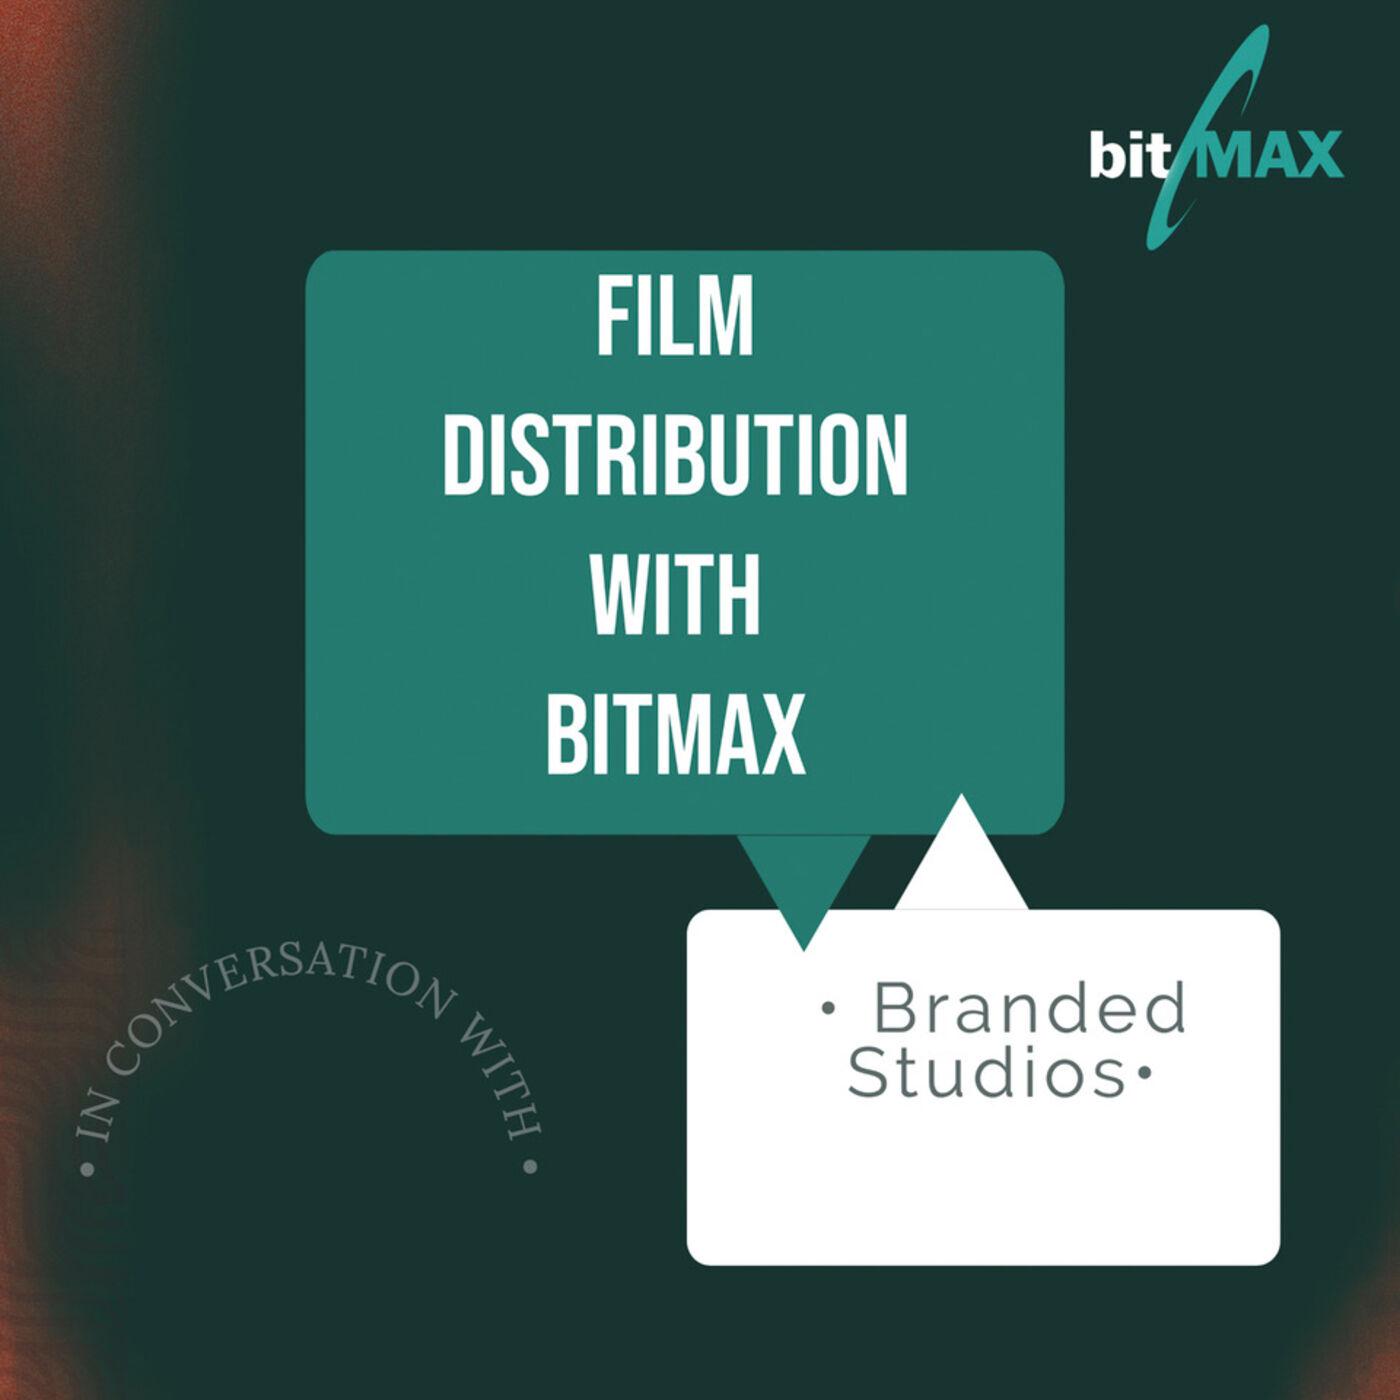 Episode 6: Branded Studios